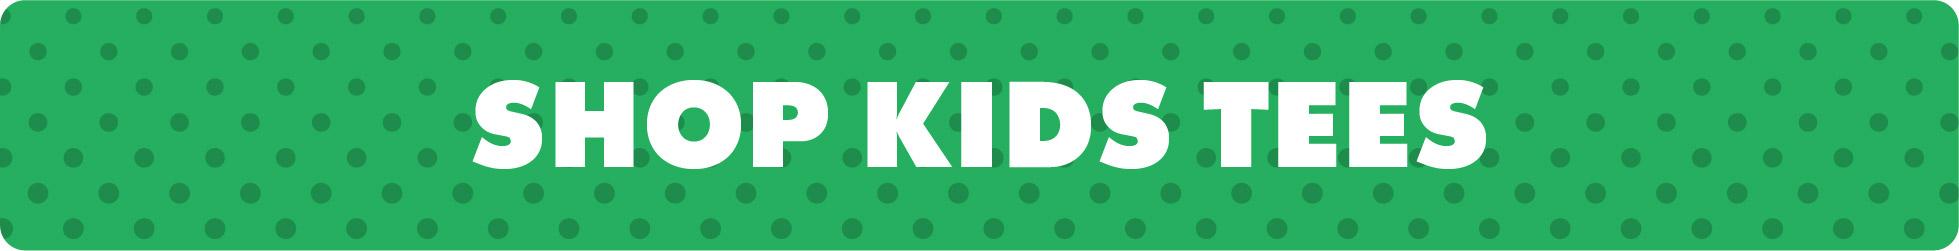 24 Hour Flash Sale - $10 Kids Tees